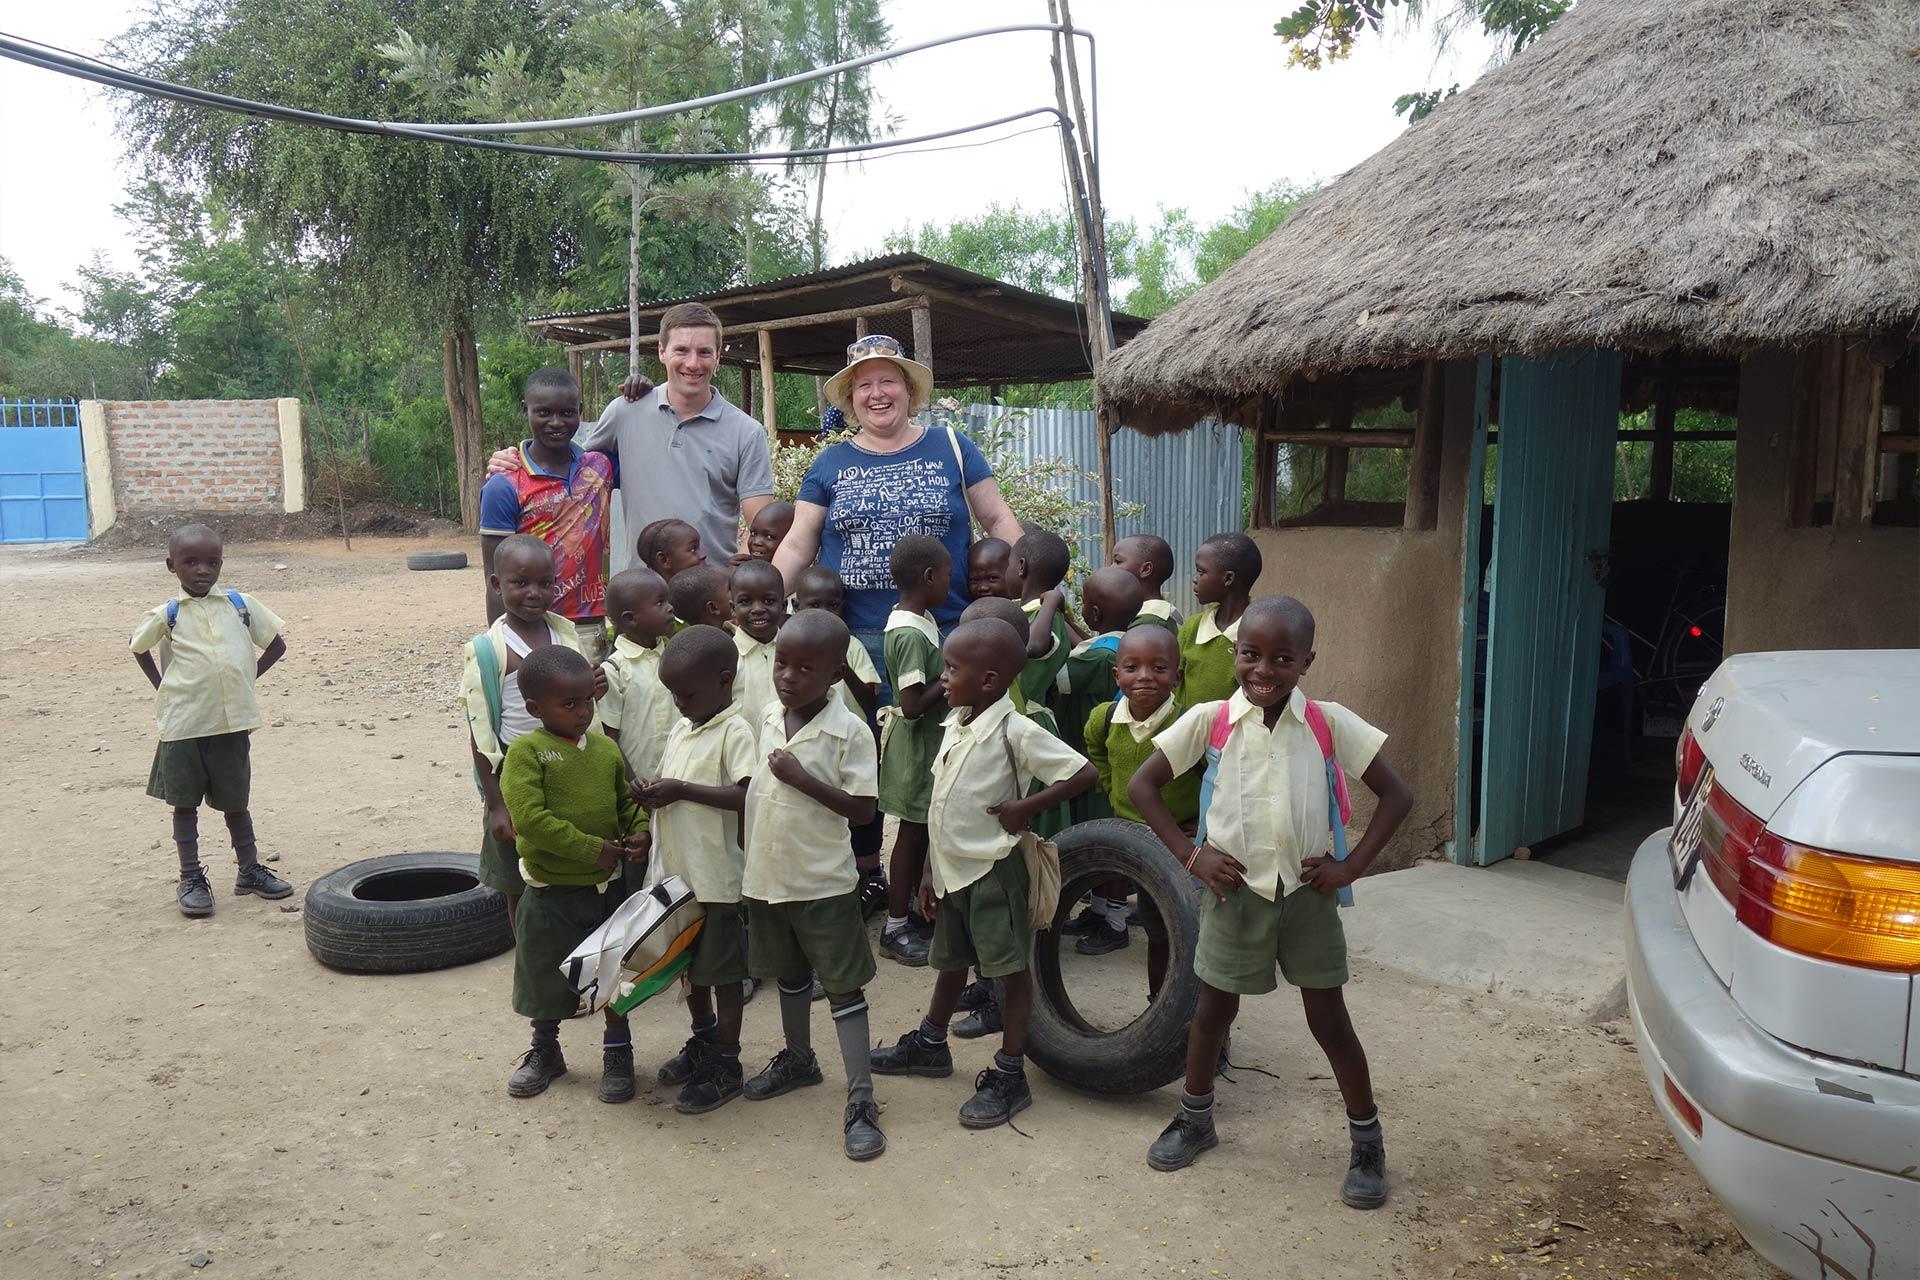 Irmgard und Josef in Kenia